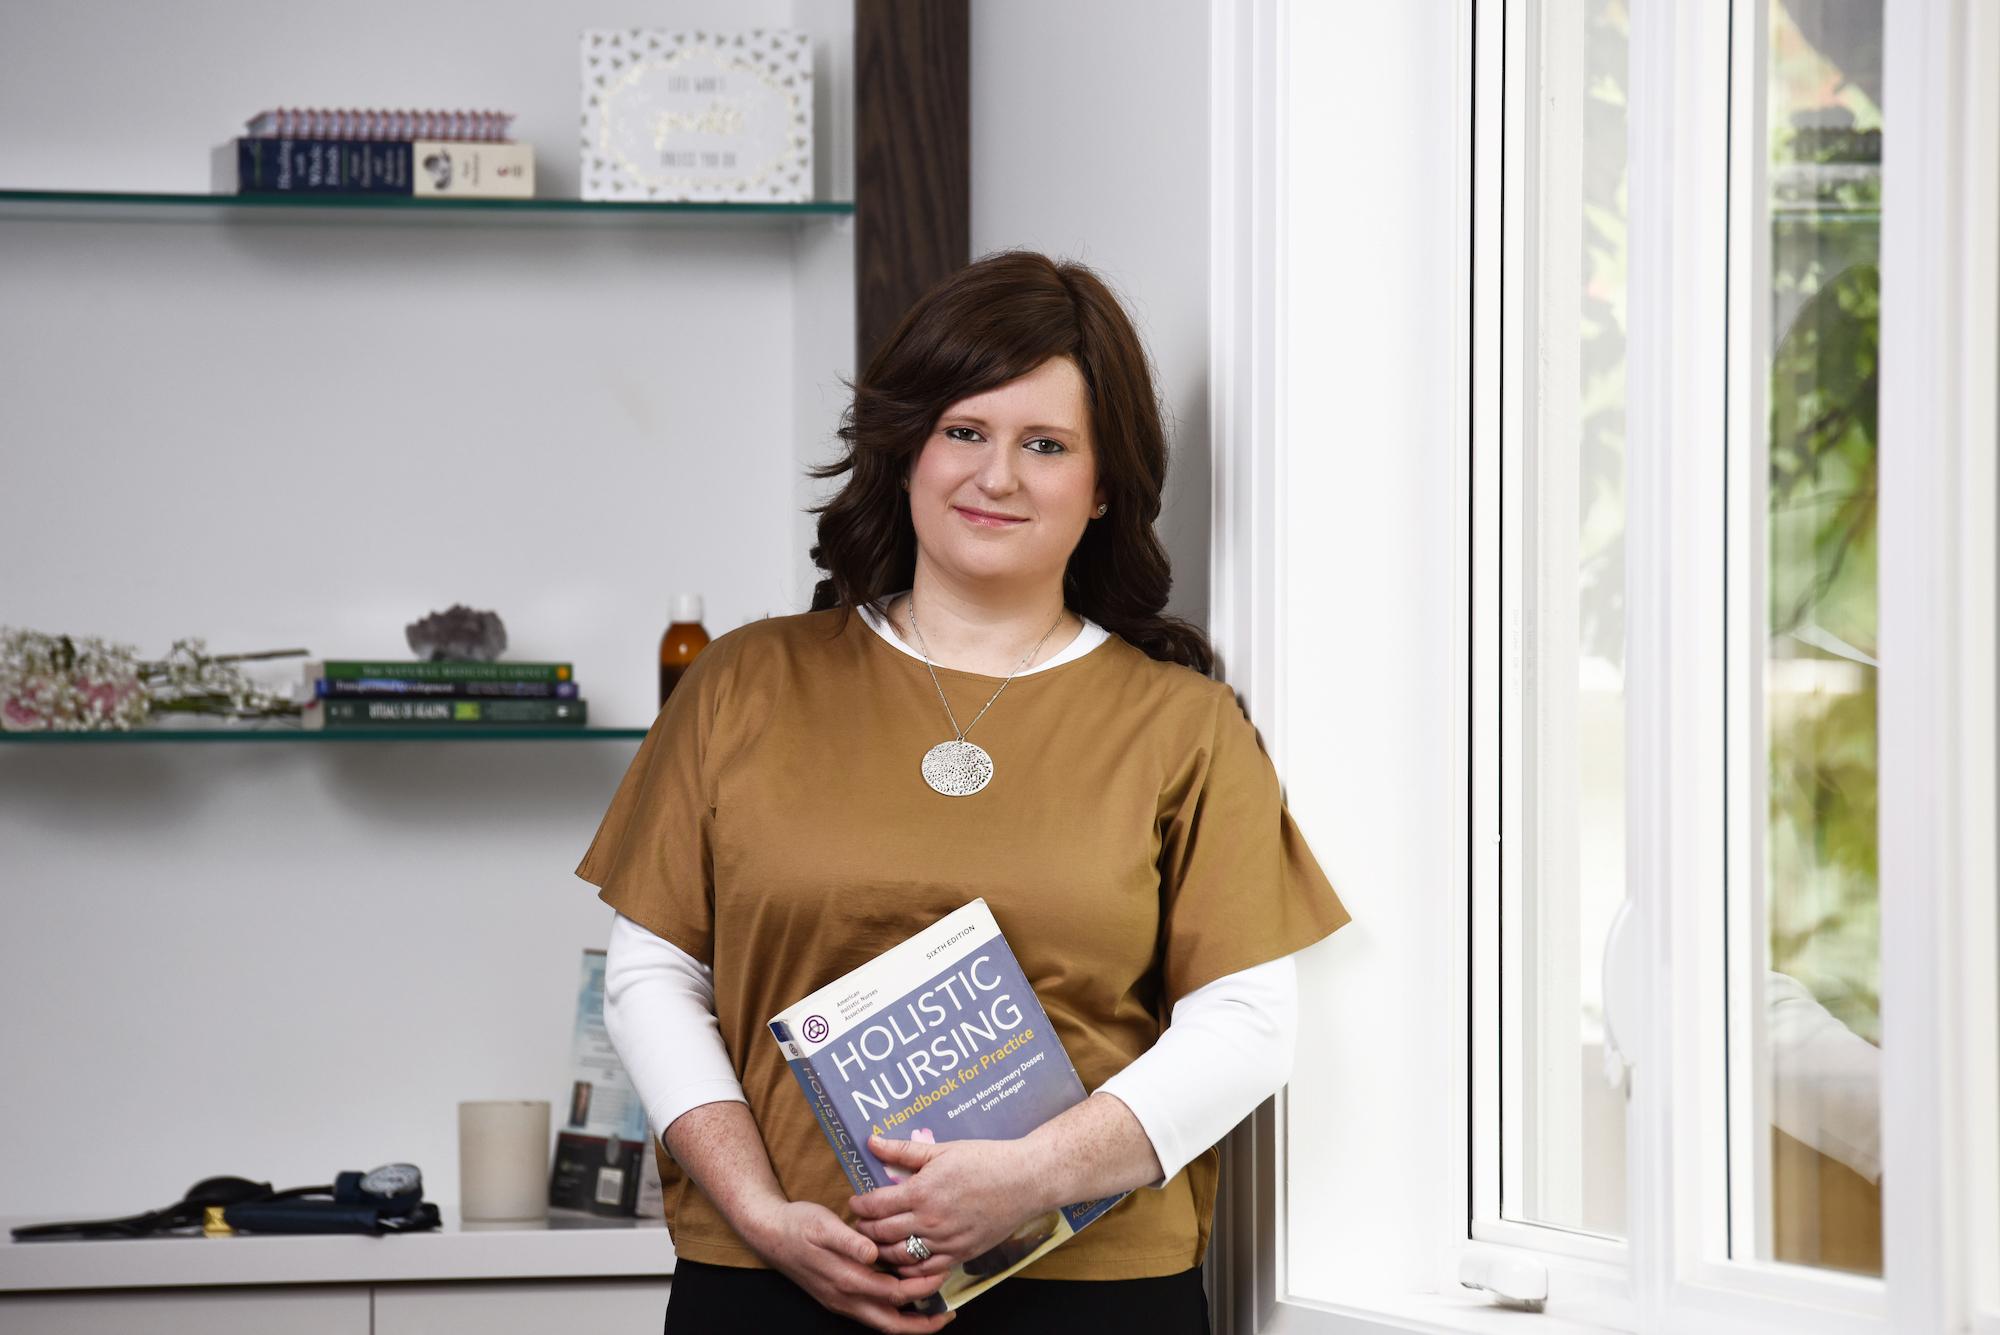 Dynamic Health Founder and Registered Nurse Leah Weisberg